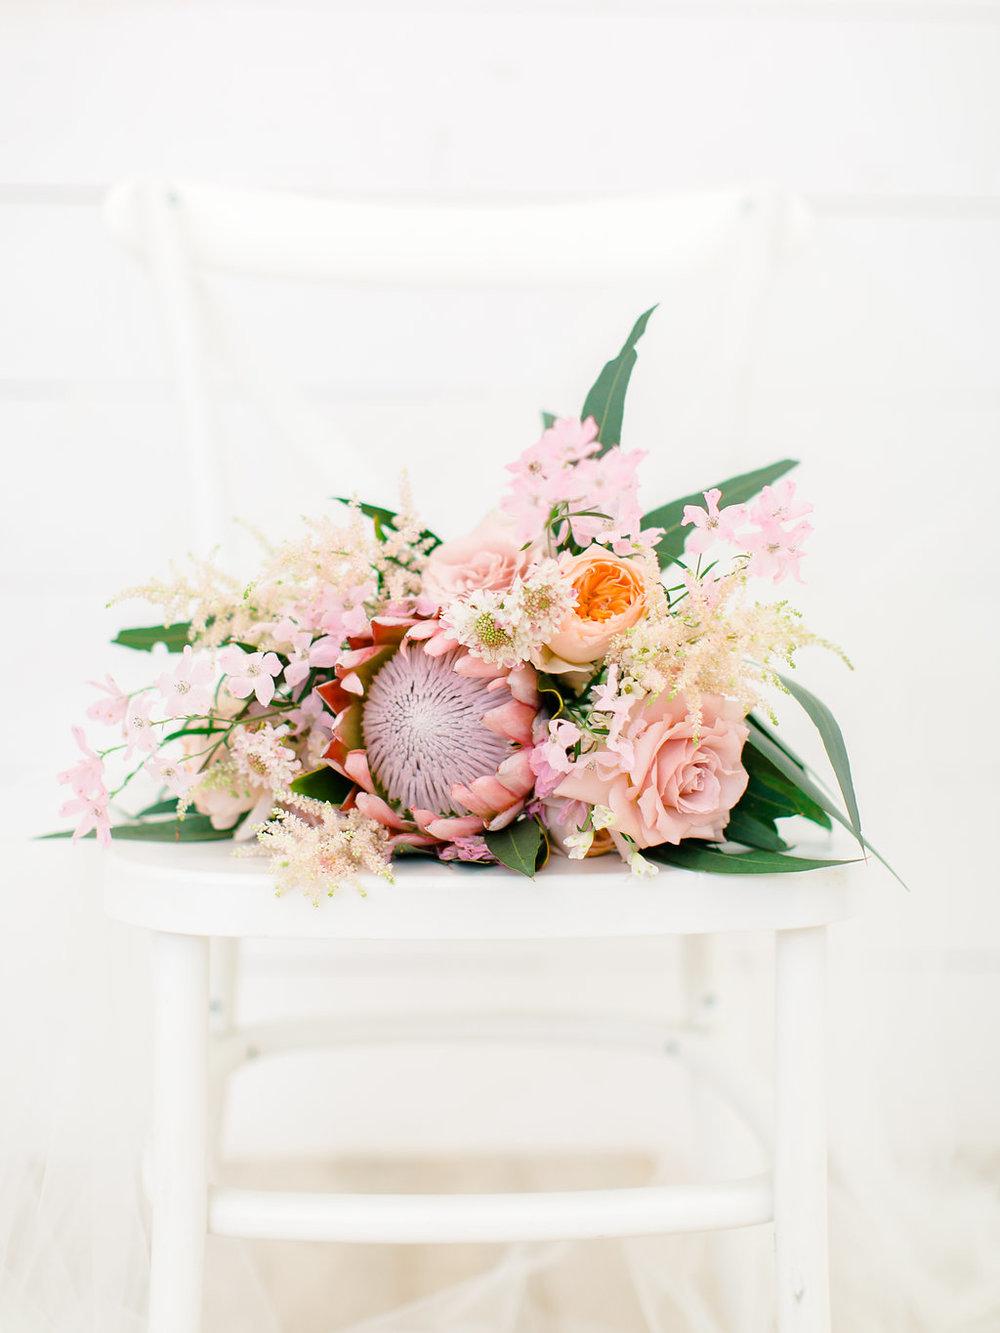 Best-Austin-Denver-California-Wedding-Photographer-Nest-Ruth-Farms-4.jpg